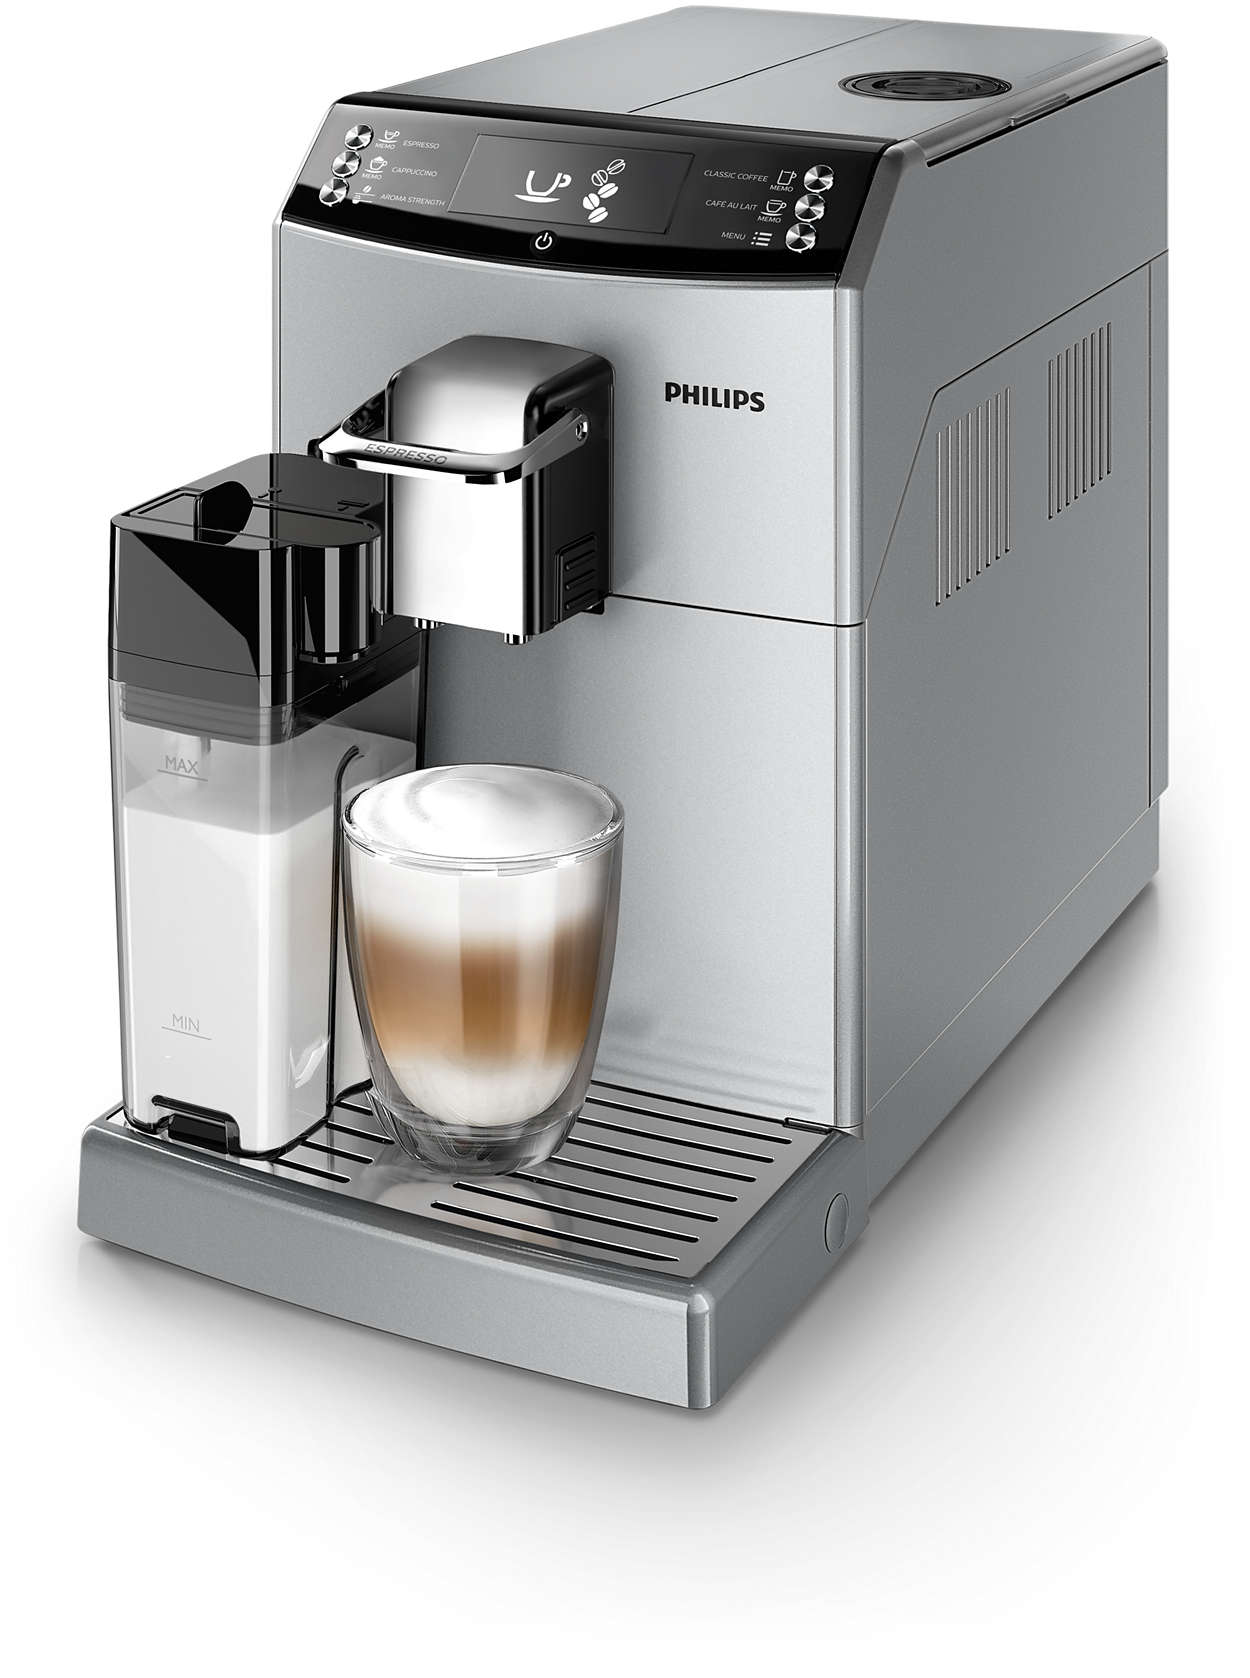 4000 series kaffeevollautomat ep4051 10 philips. Black Bedroom Furniture Sets. Home Design Ideas